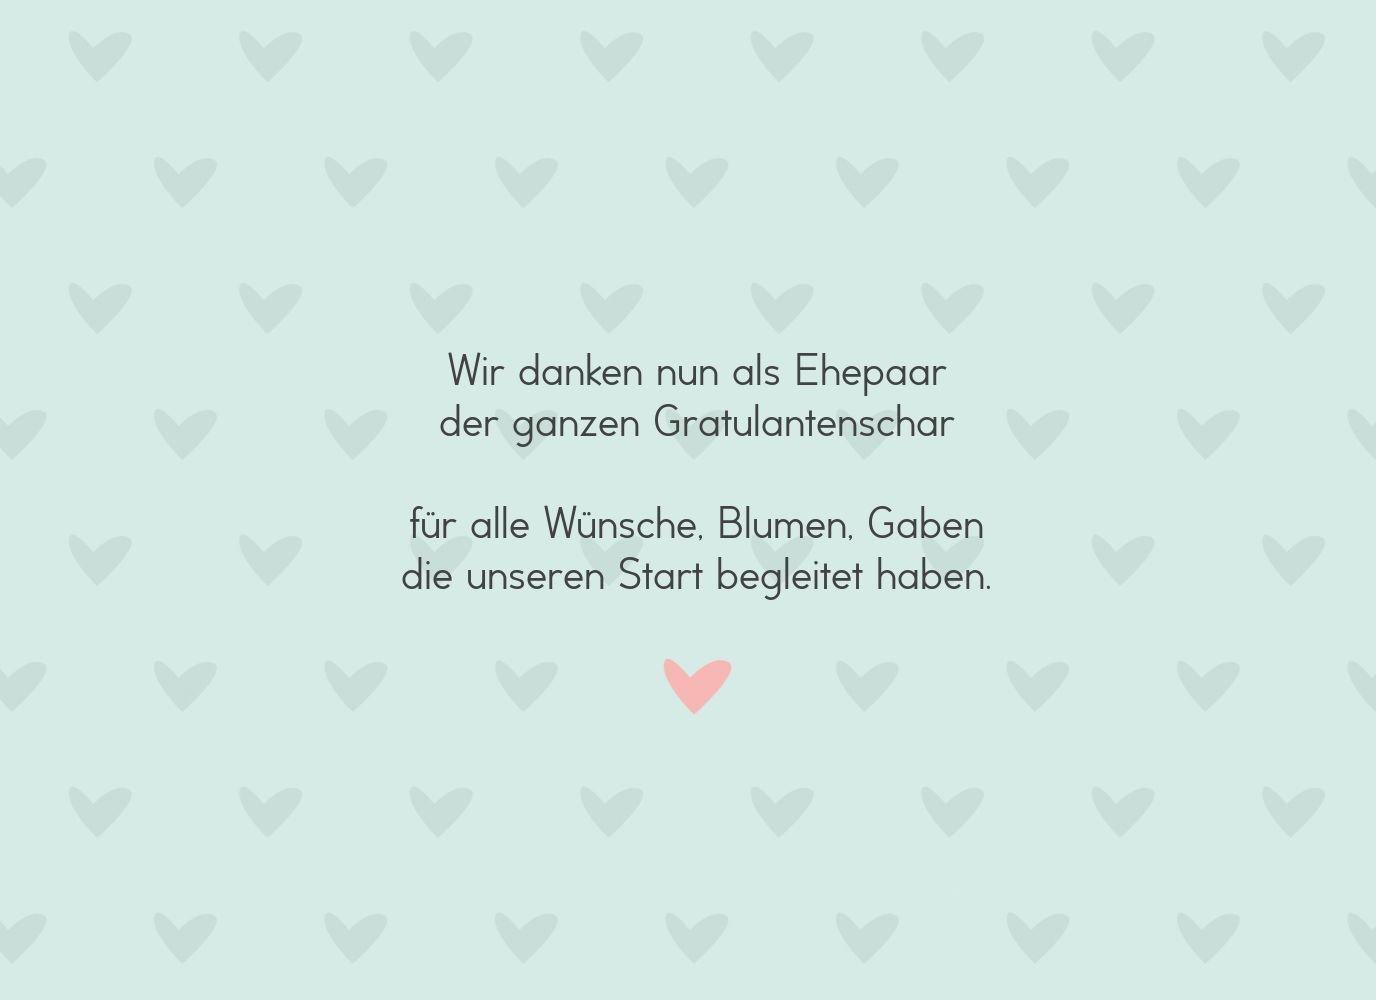 Hochzeit Dankeskarte Pärchen - Männer, Männer, Männer, 10 Karten, Rosa B07B6RMMCJ | Niedriger Preis  | Verkaufspreis  | Ausgezeichnet (in) Qualität  2dfd1f